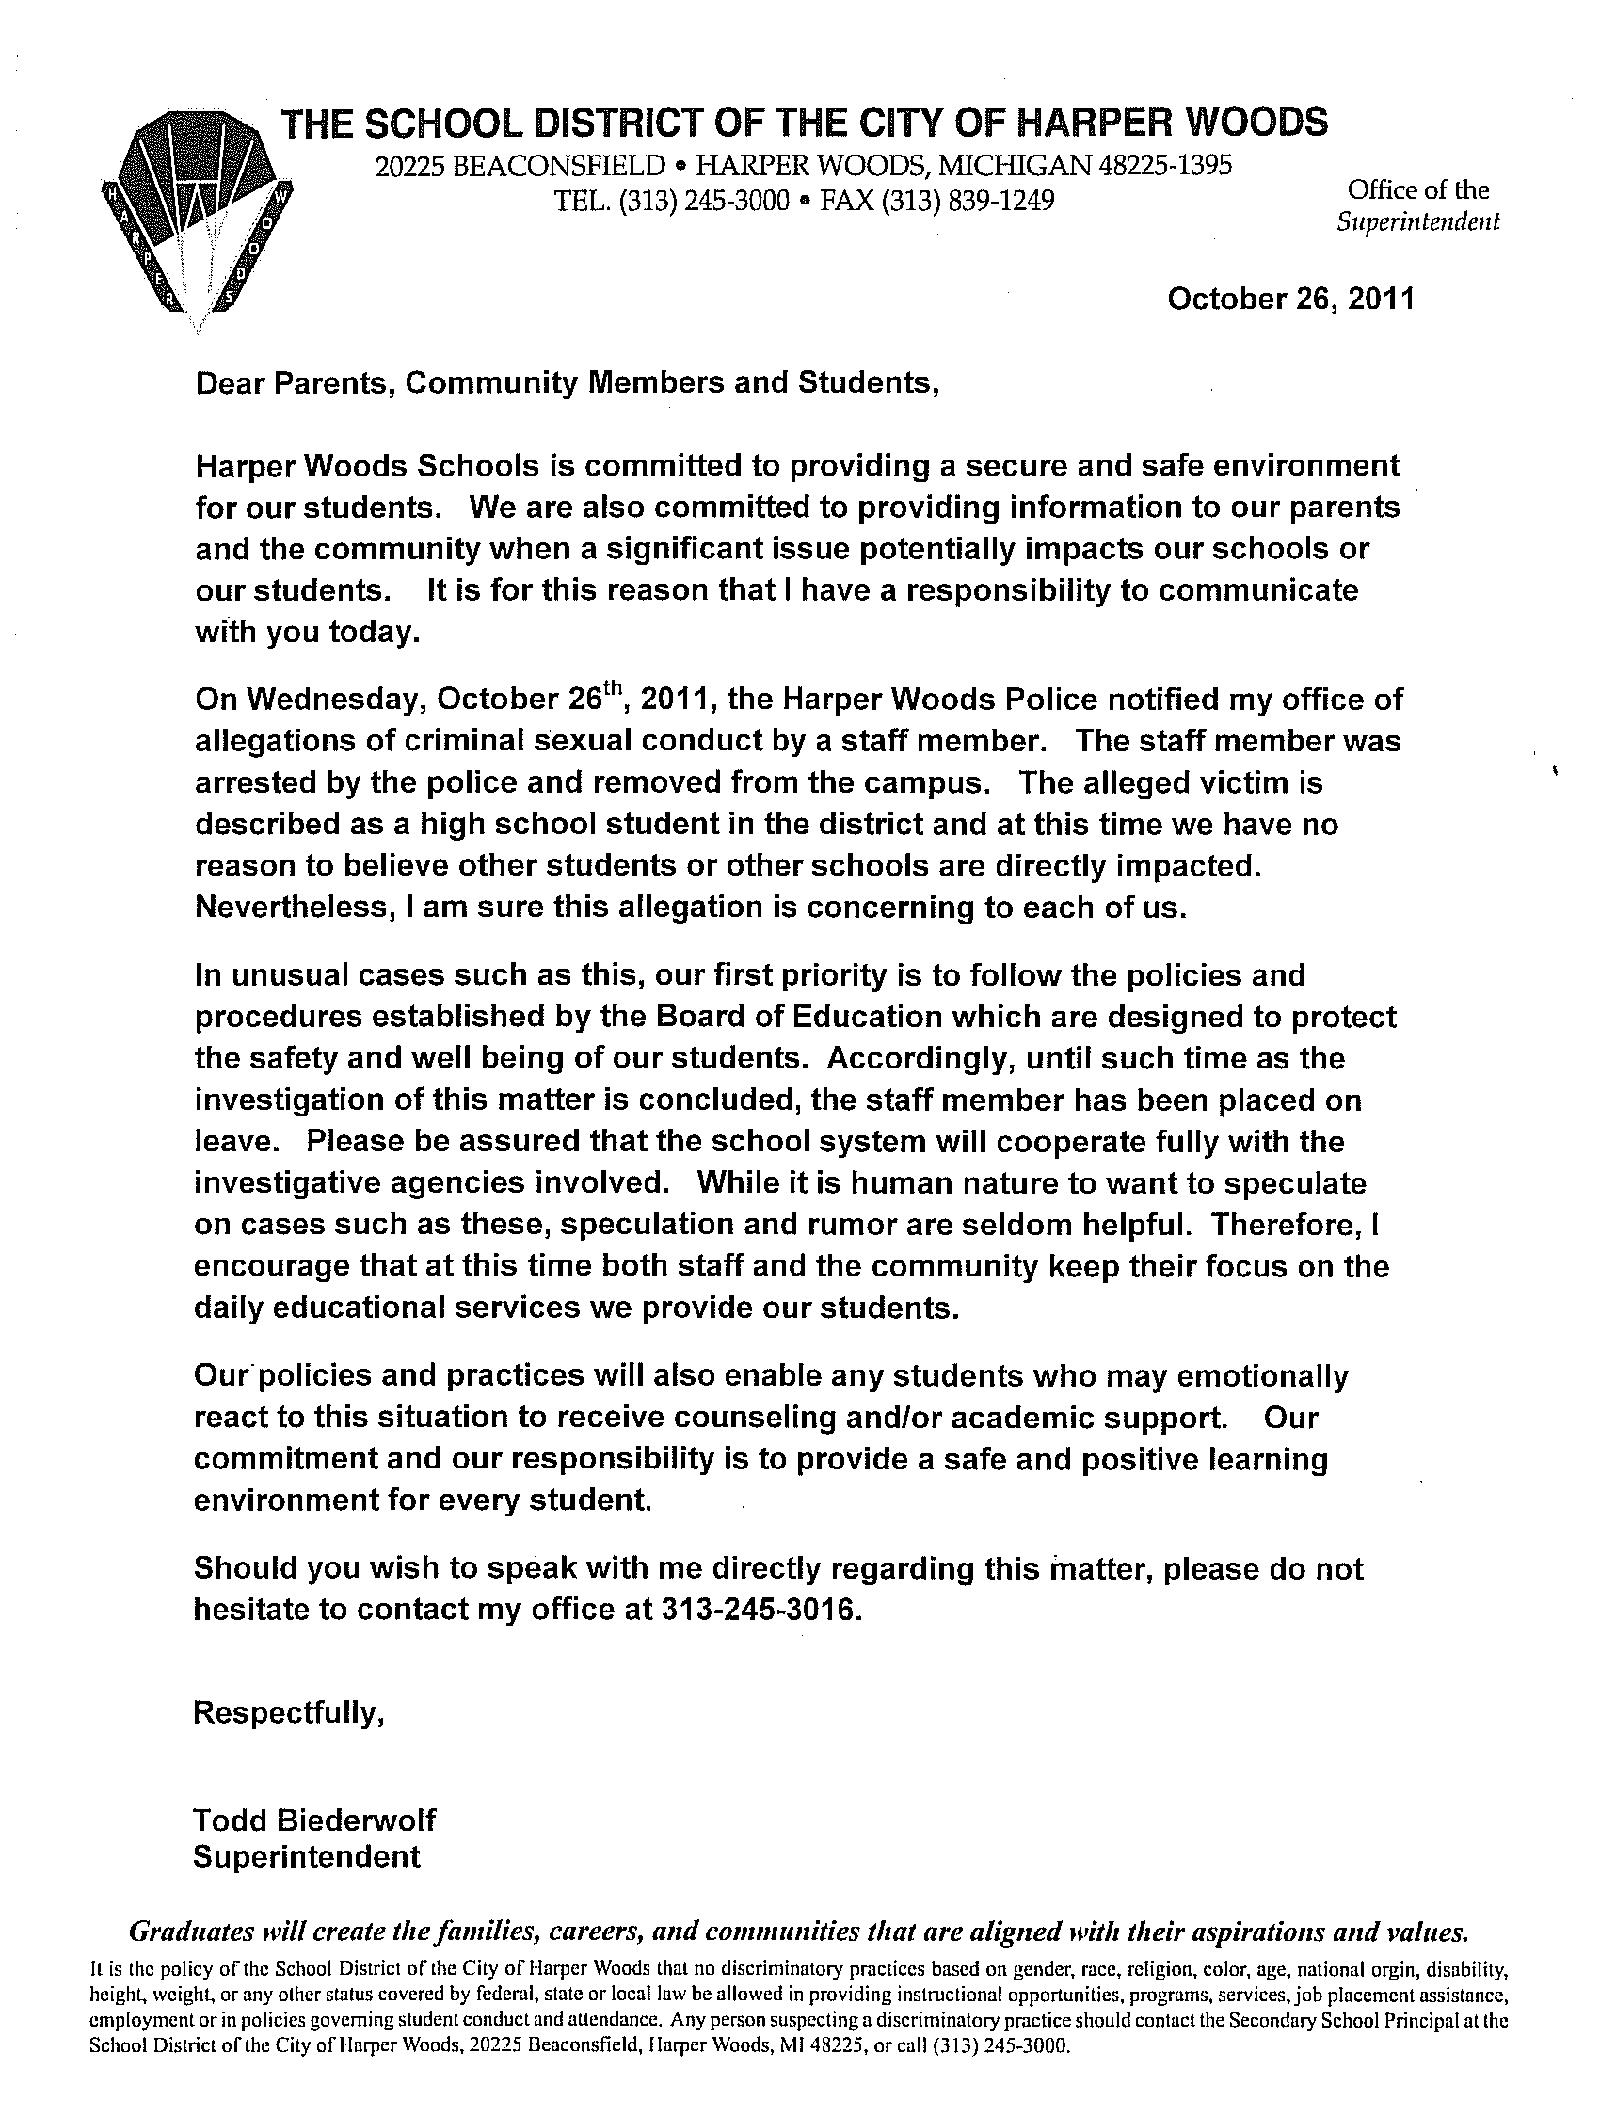 Michigan wayne county harper woods - Harper Woods Hs Letter Png